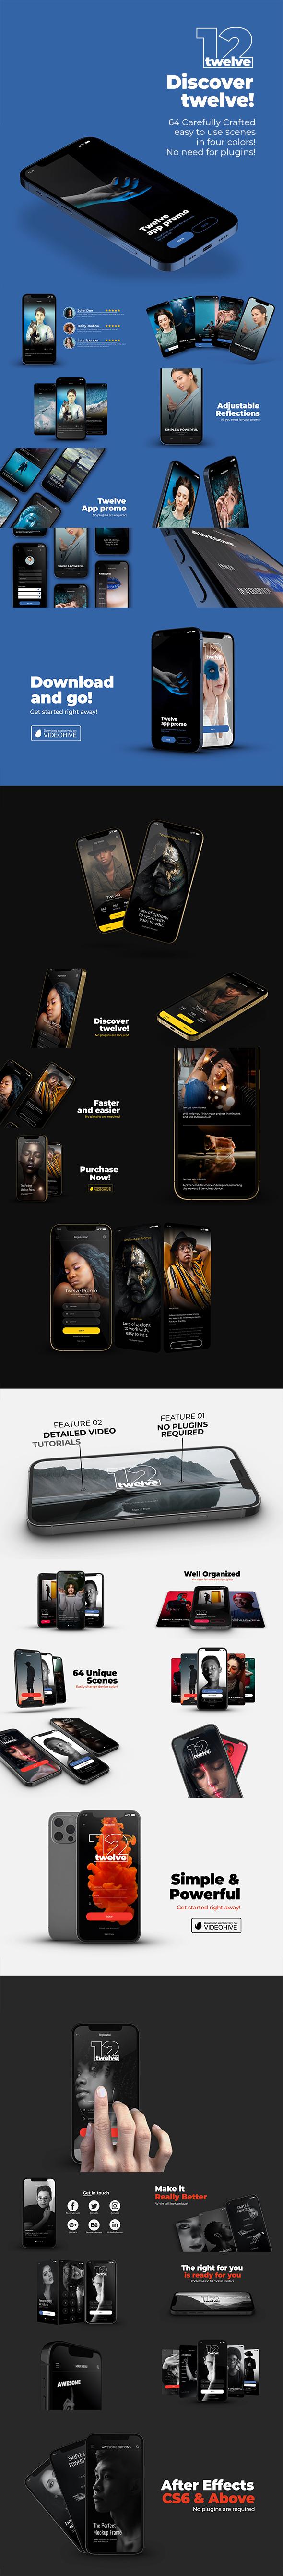 Twelve App Promo - 5